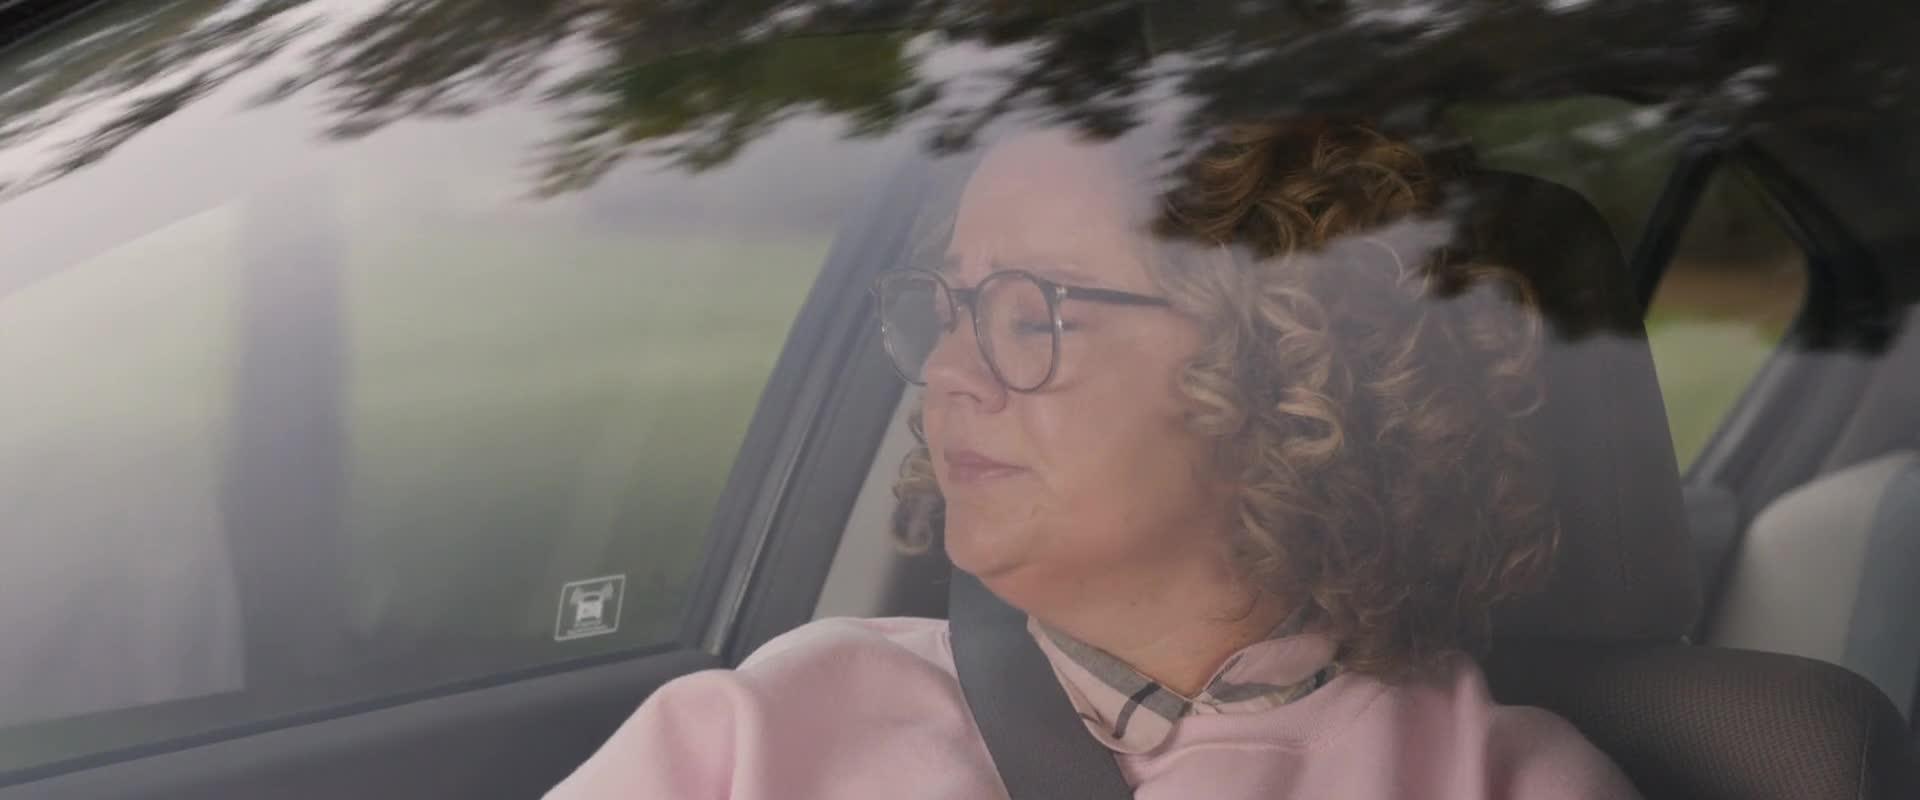 Zivot je vecirek 2018 CZ dabing HD